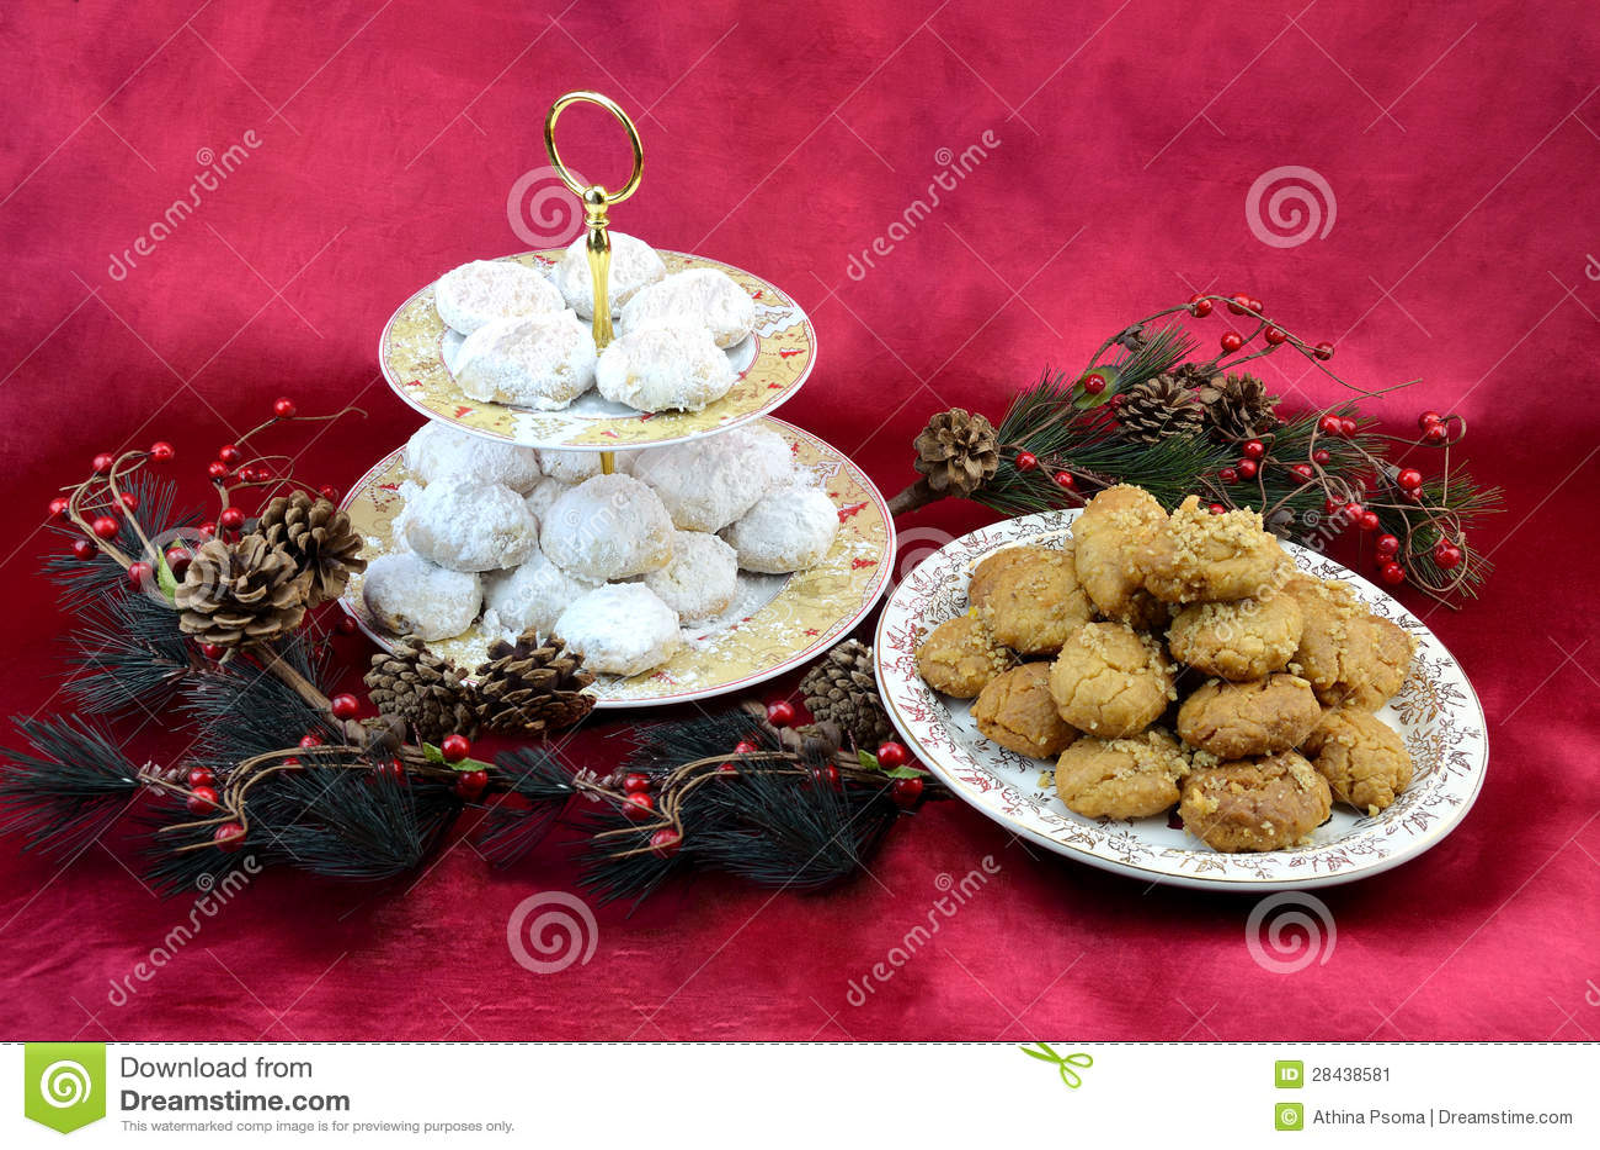 Greek traditional christmas desserts stock image image for List of traditional christmas desserts